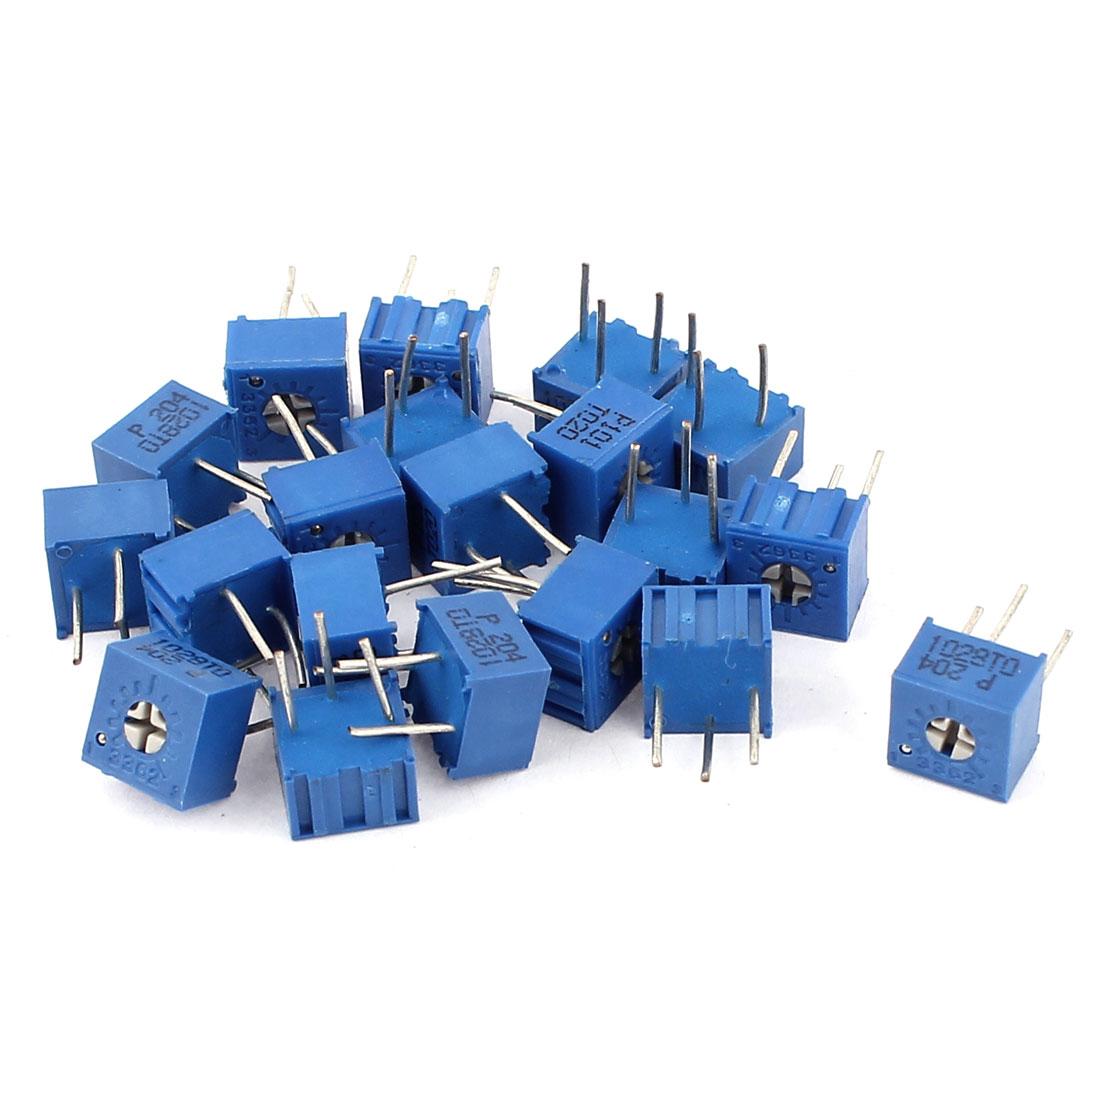 20Pcs Potentiometer Trimmer Variable Resistor 3362P-101 3362P-204